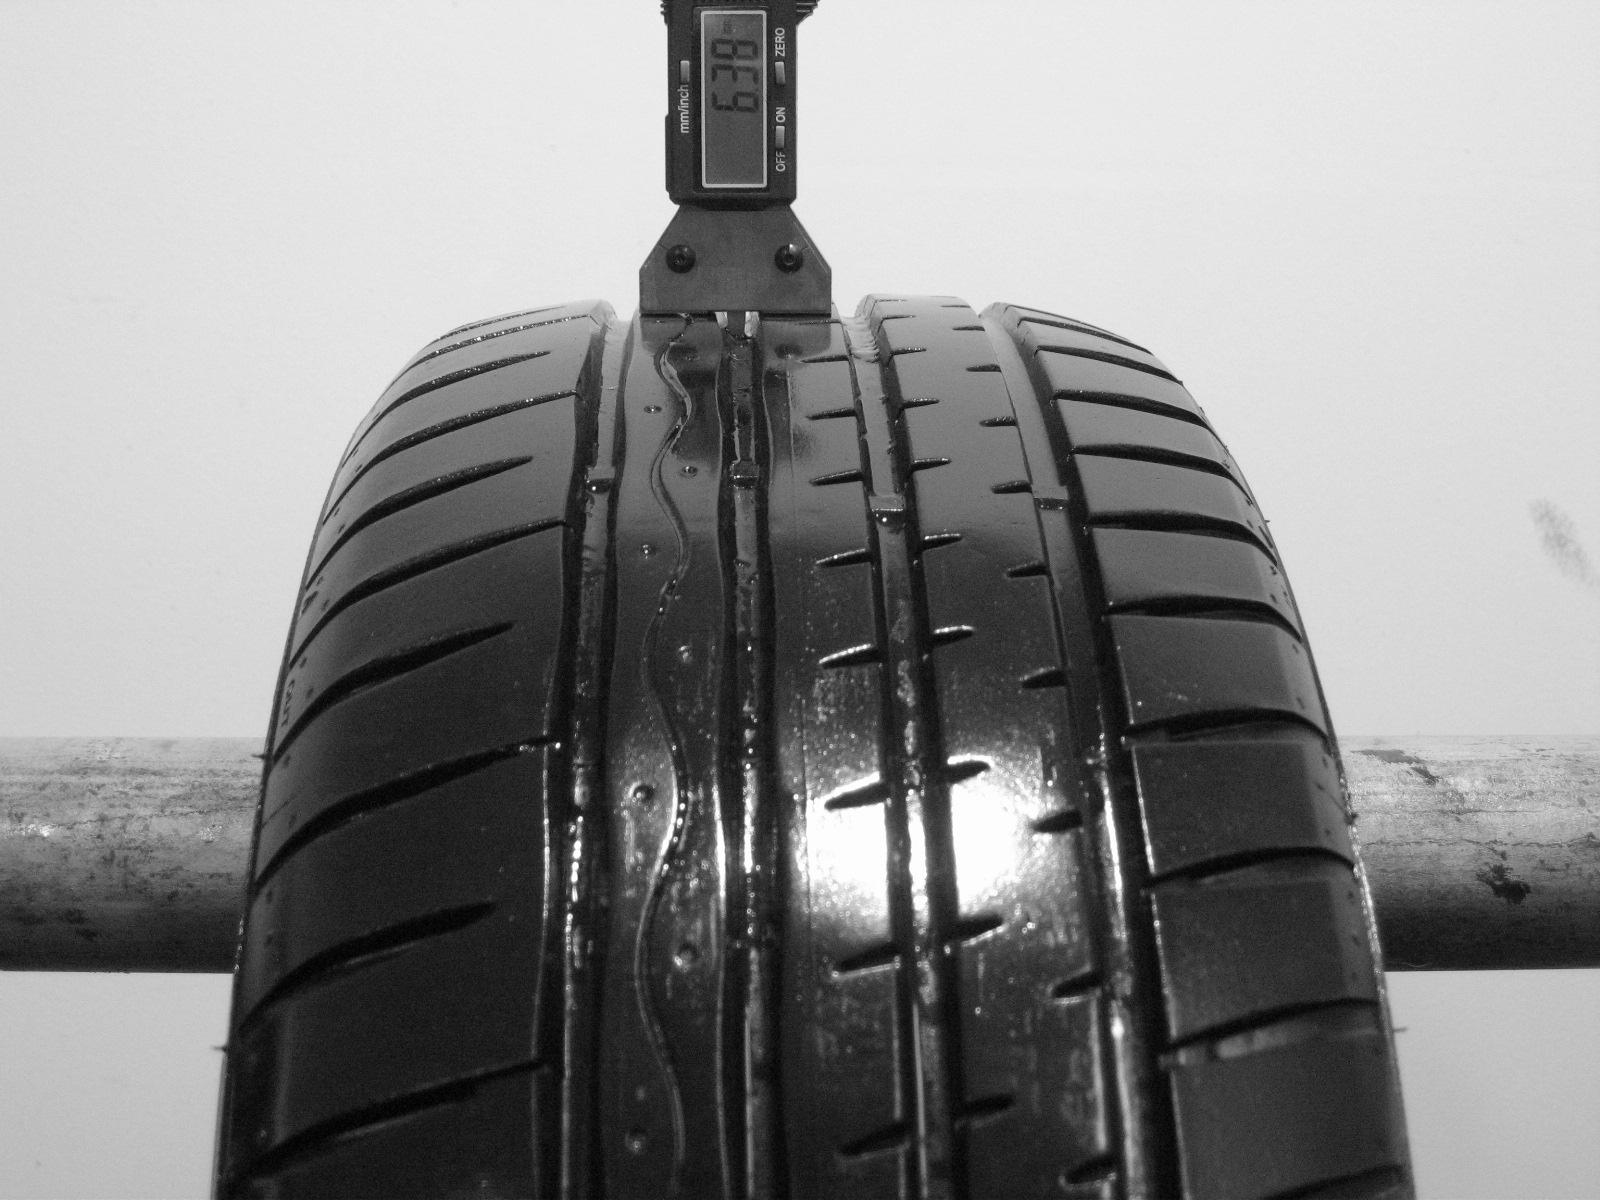 Použité-Pneu-Bazar - 205/55 R16 HANKOOK VENTUS S1 EVO -kusovka-rezerva 3mm